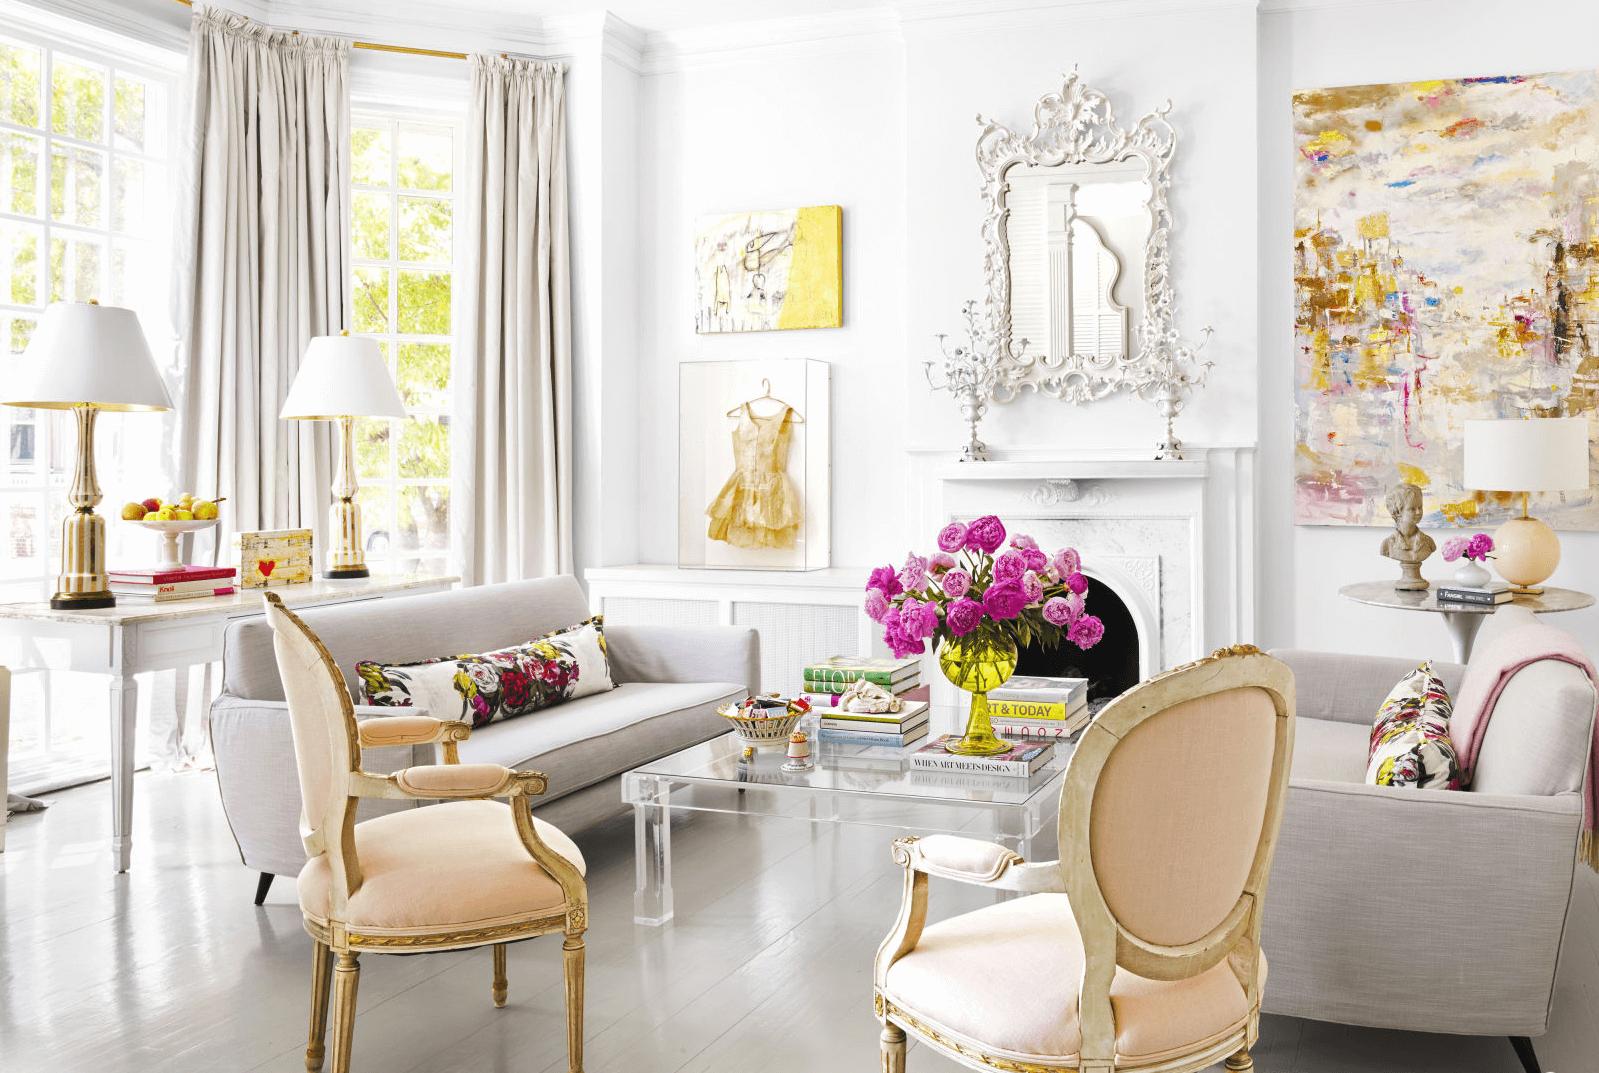 living rooms new home design trends | 5 Spring Interior Design Trends To Celebrate | Decorilla